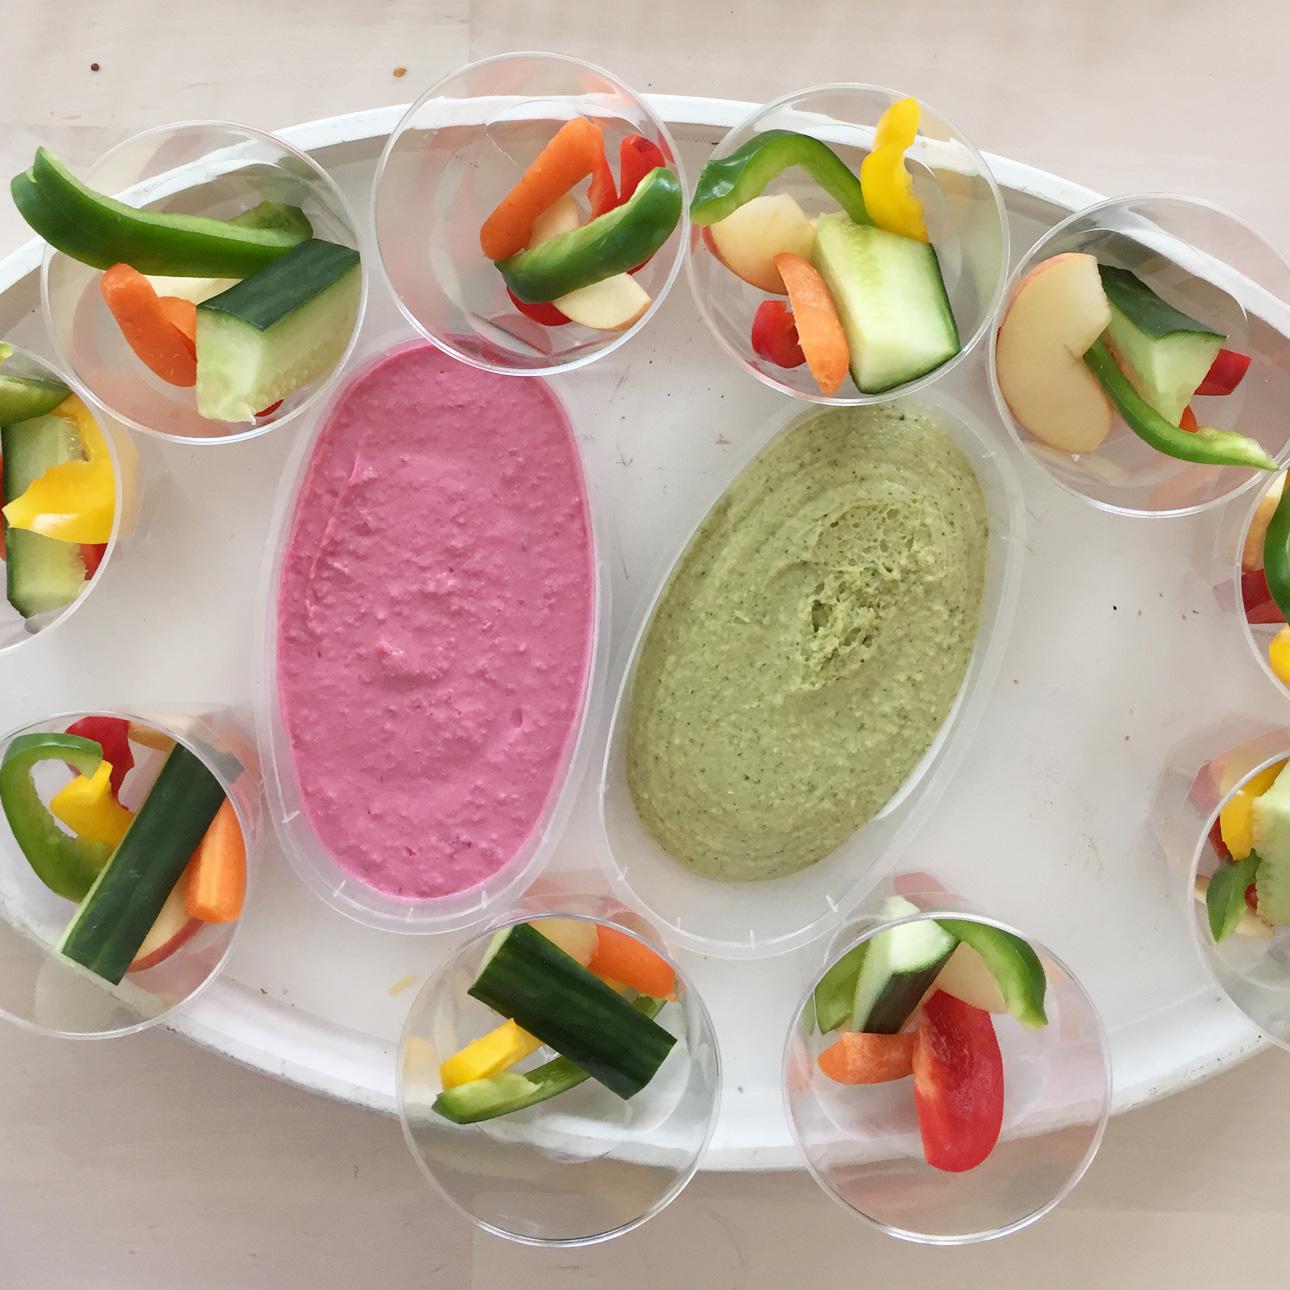 Indianen kinderfeestje groentedip humus